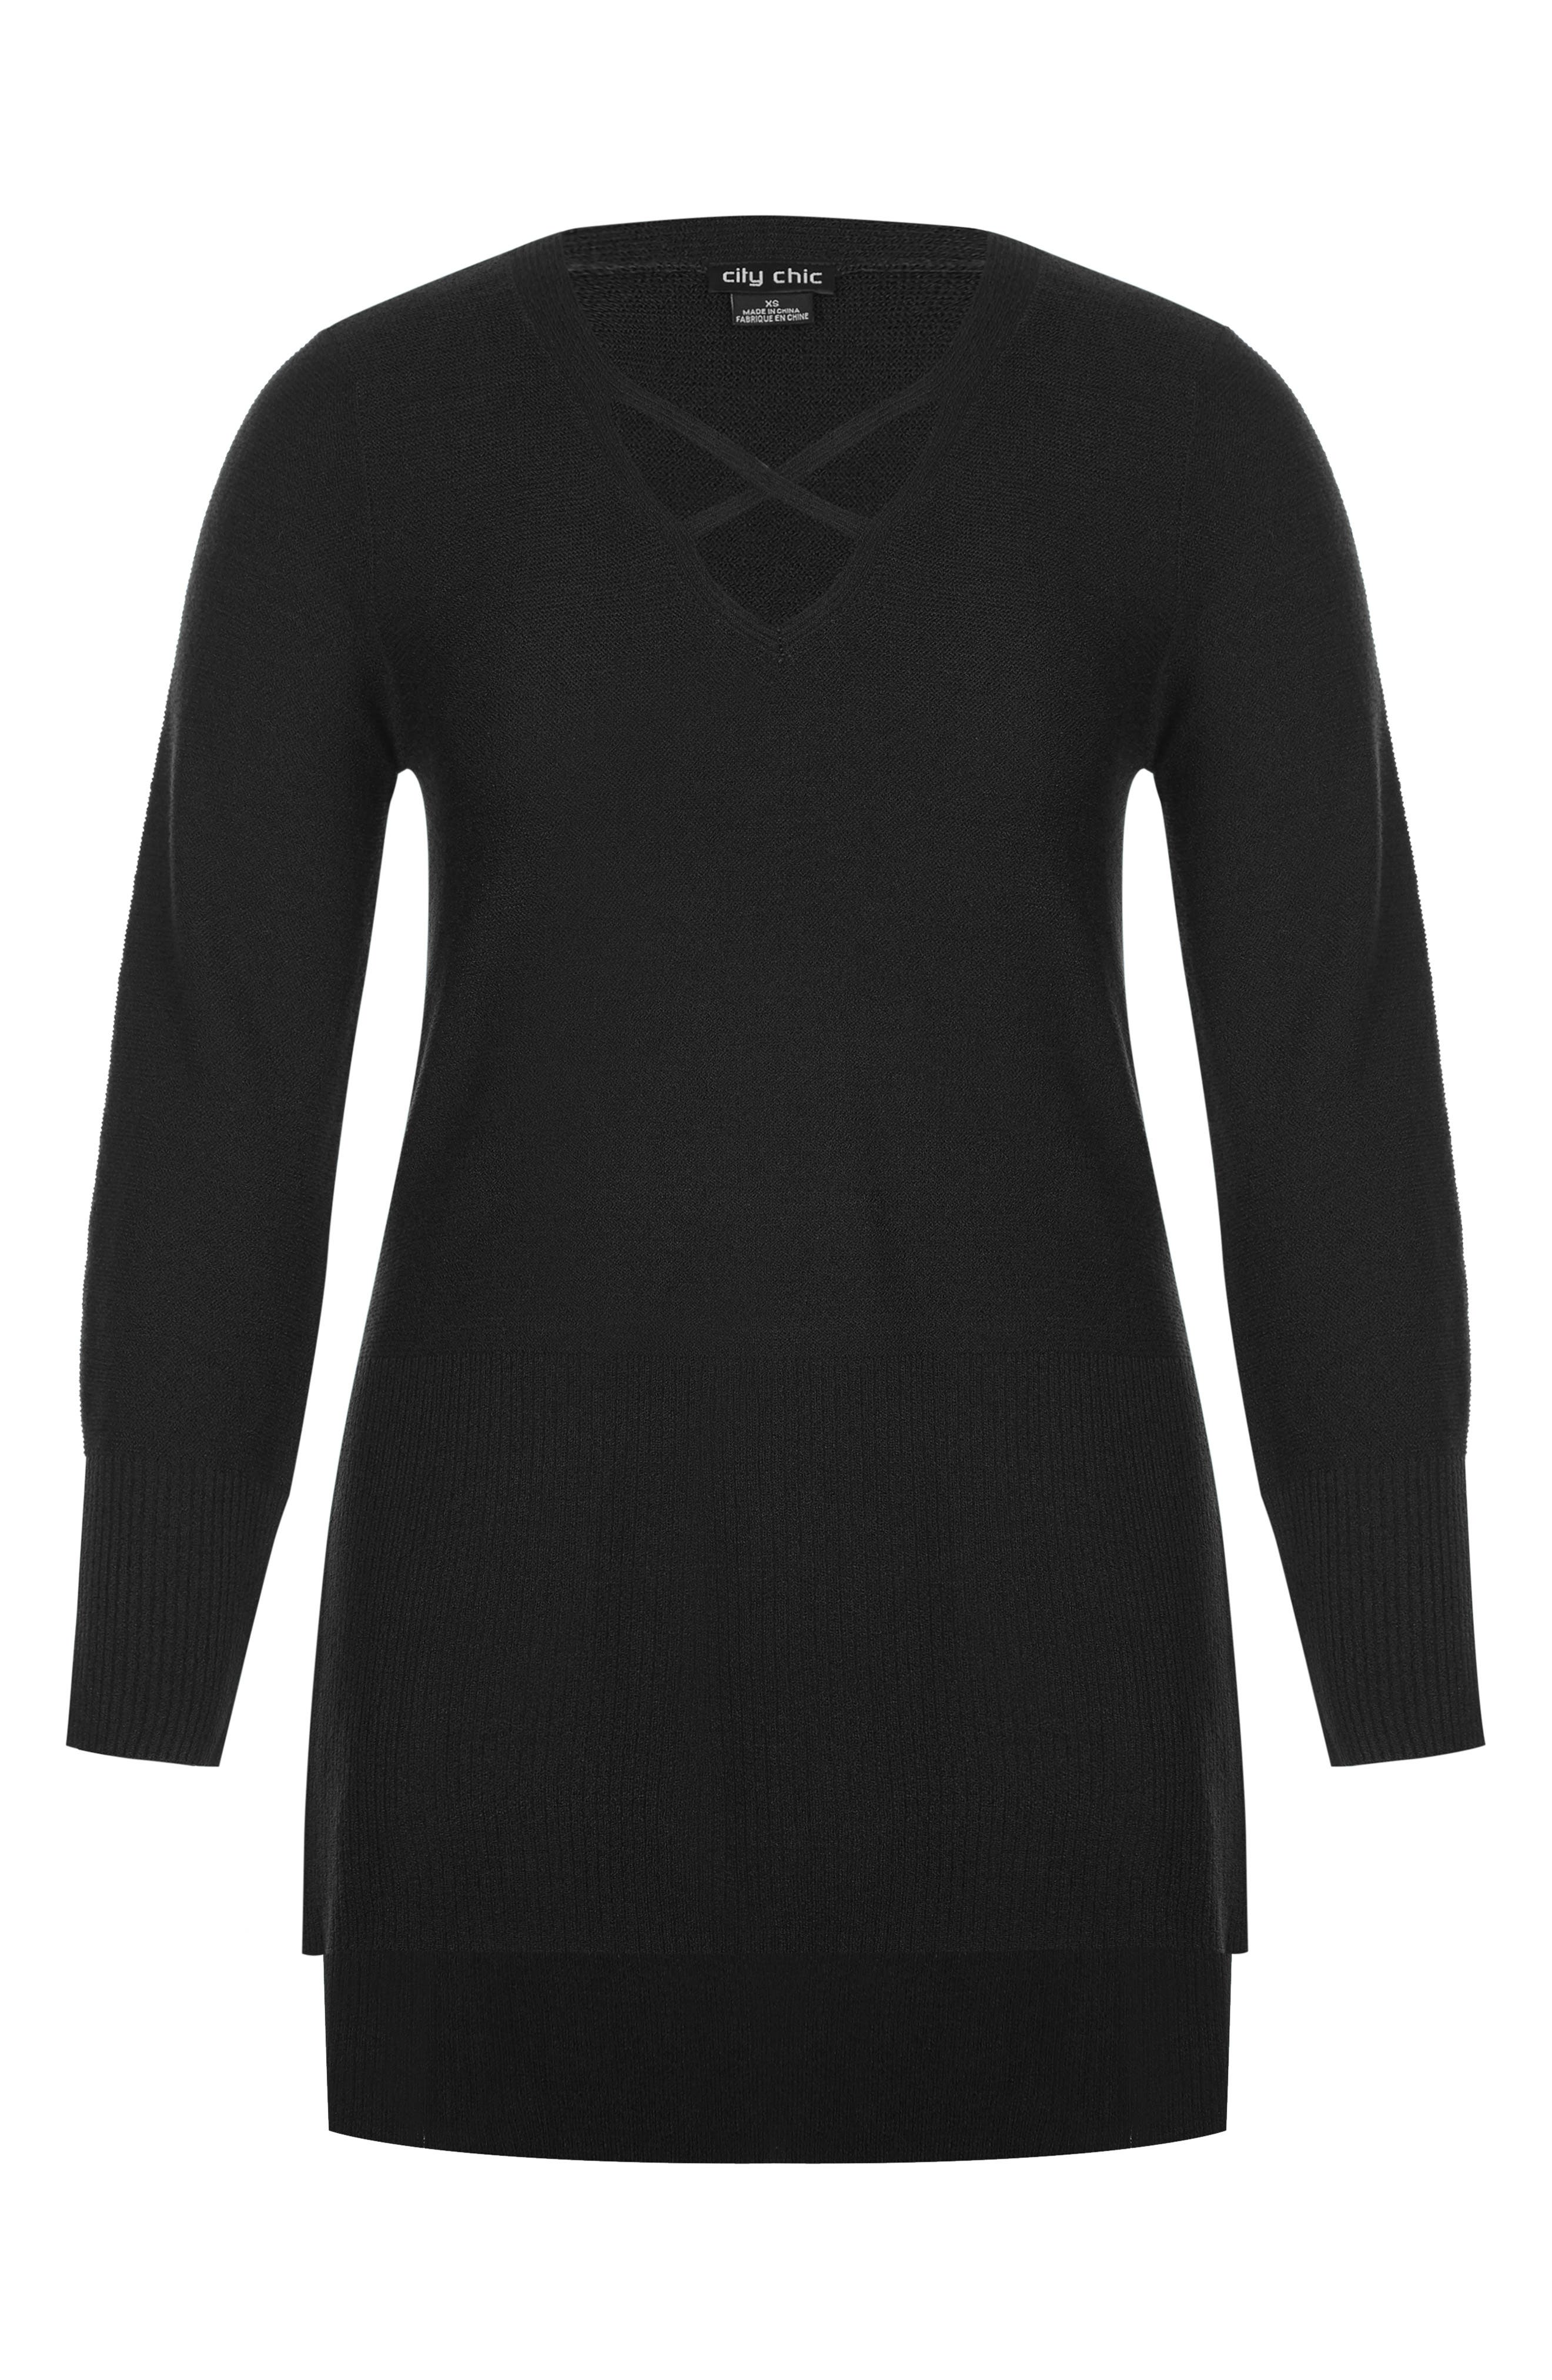 Crisscross Neck Sweater,                             Alternate thumbnail 3, color,                             BLACK